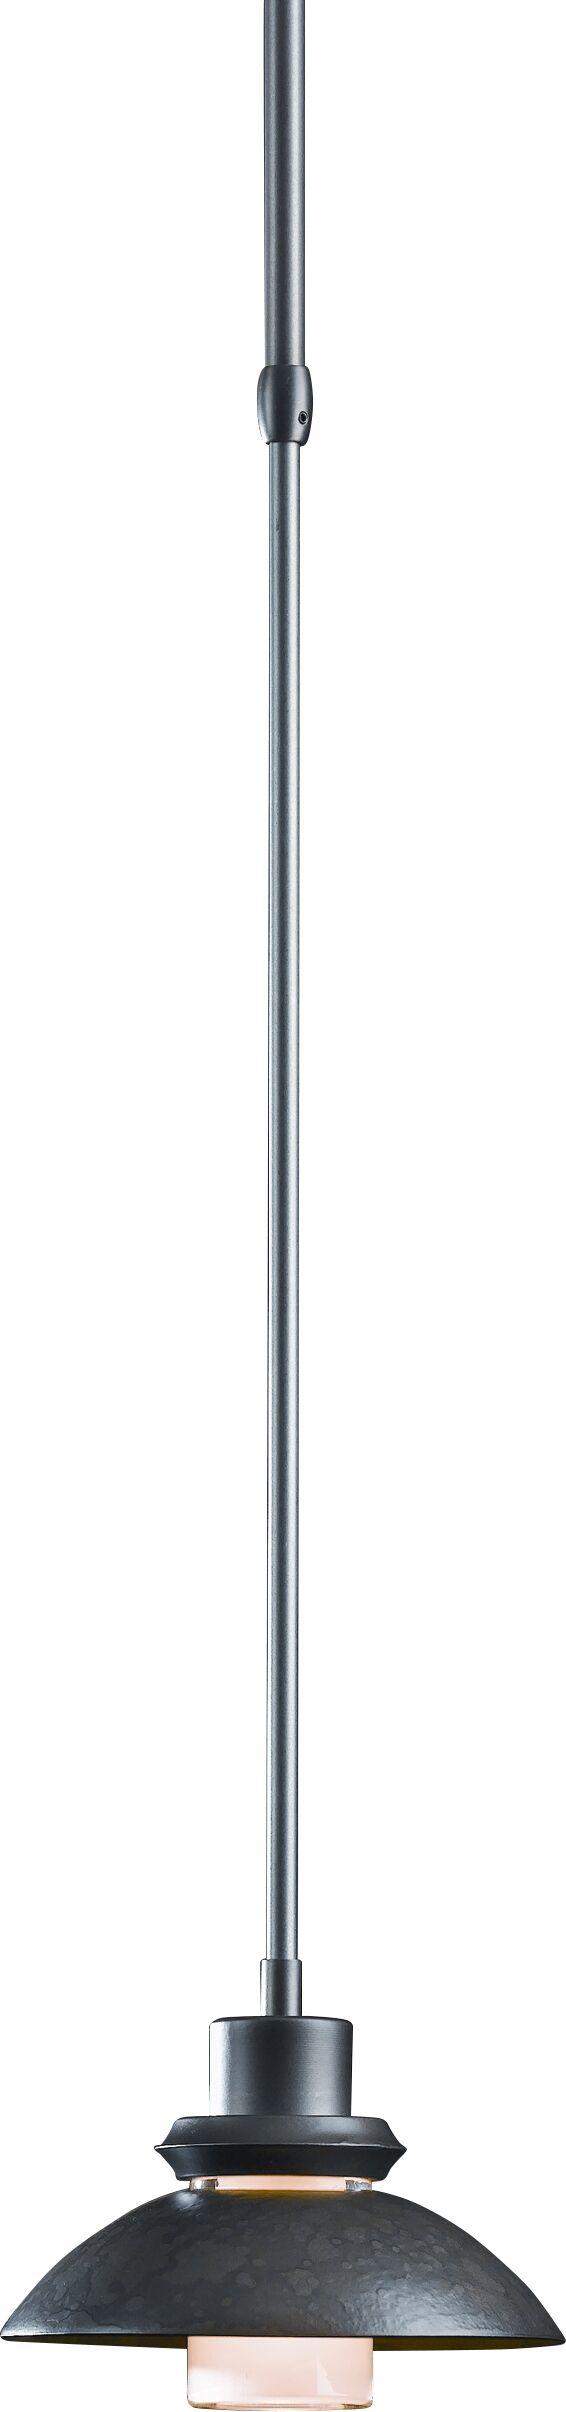 Staccato 1-Light Dome Pendant Glass: Round, Finish: Translucent Burnished Steel, Size / Stem Length: Standard / 36.5